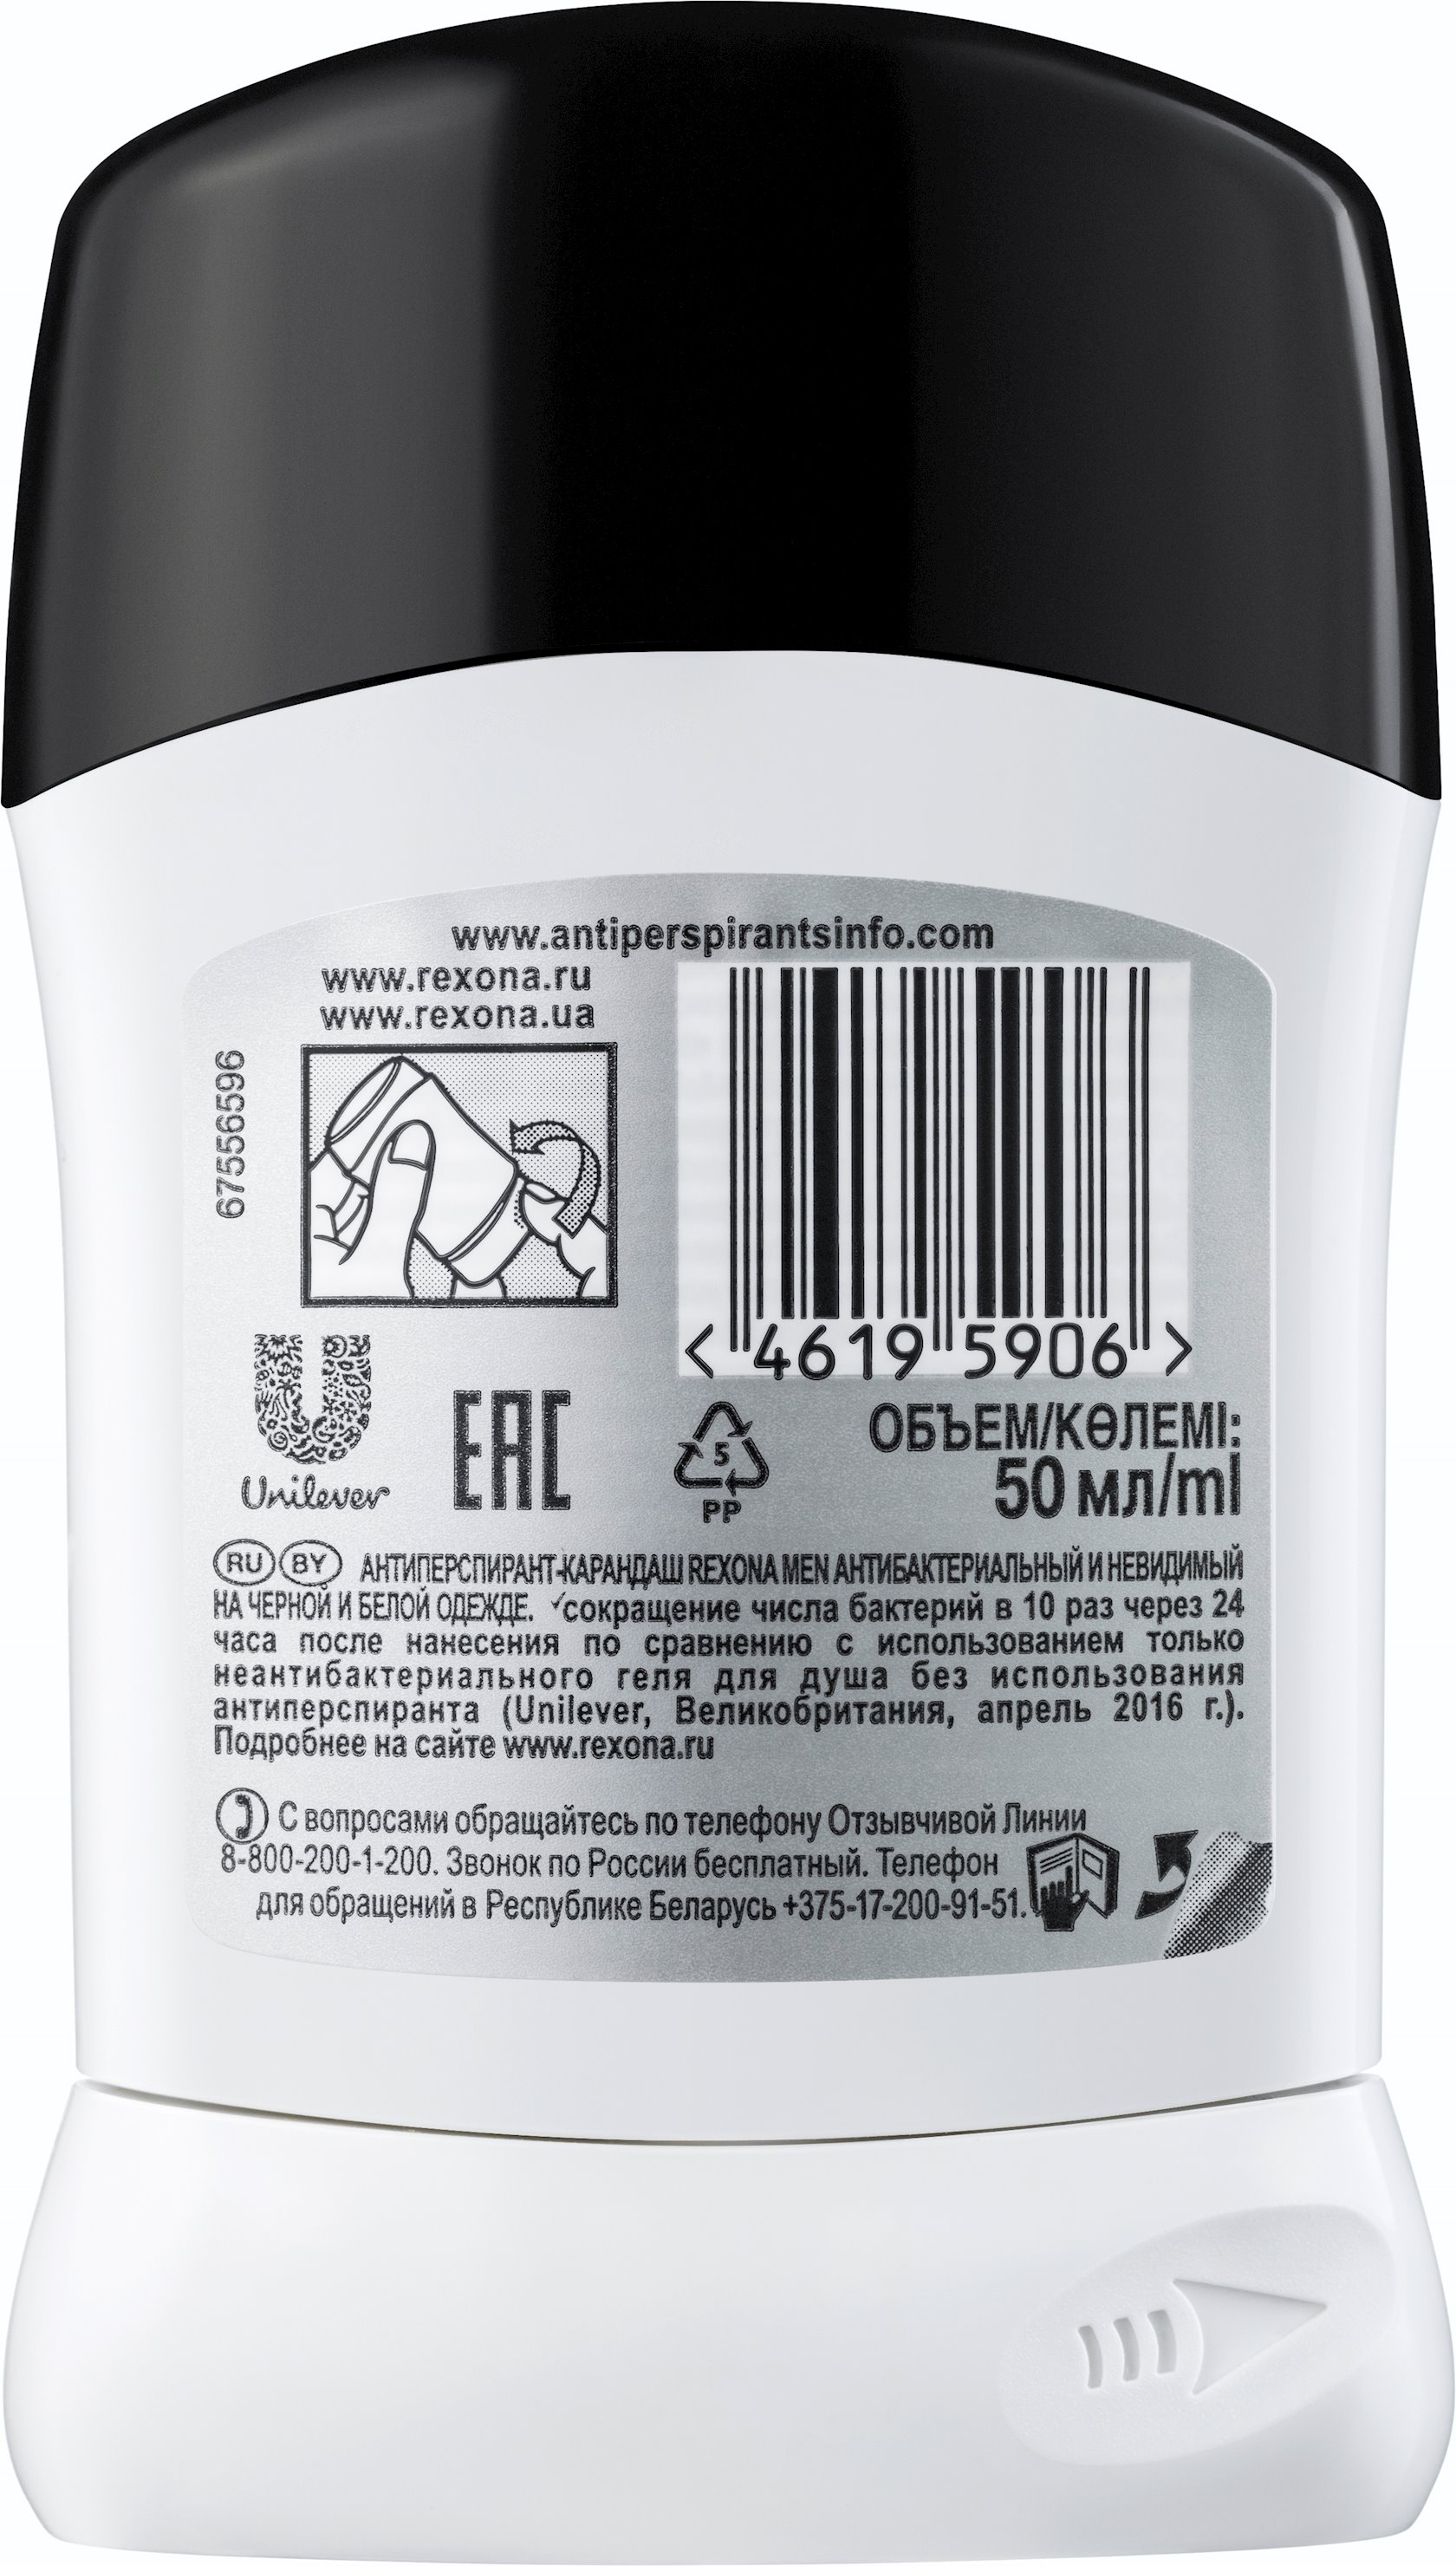 Antiperspirant Rexona Men Antibakterial və Görünməz 50 ml